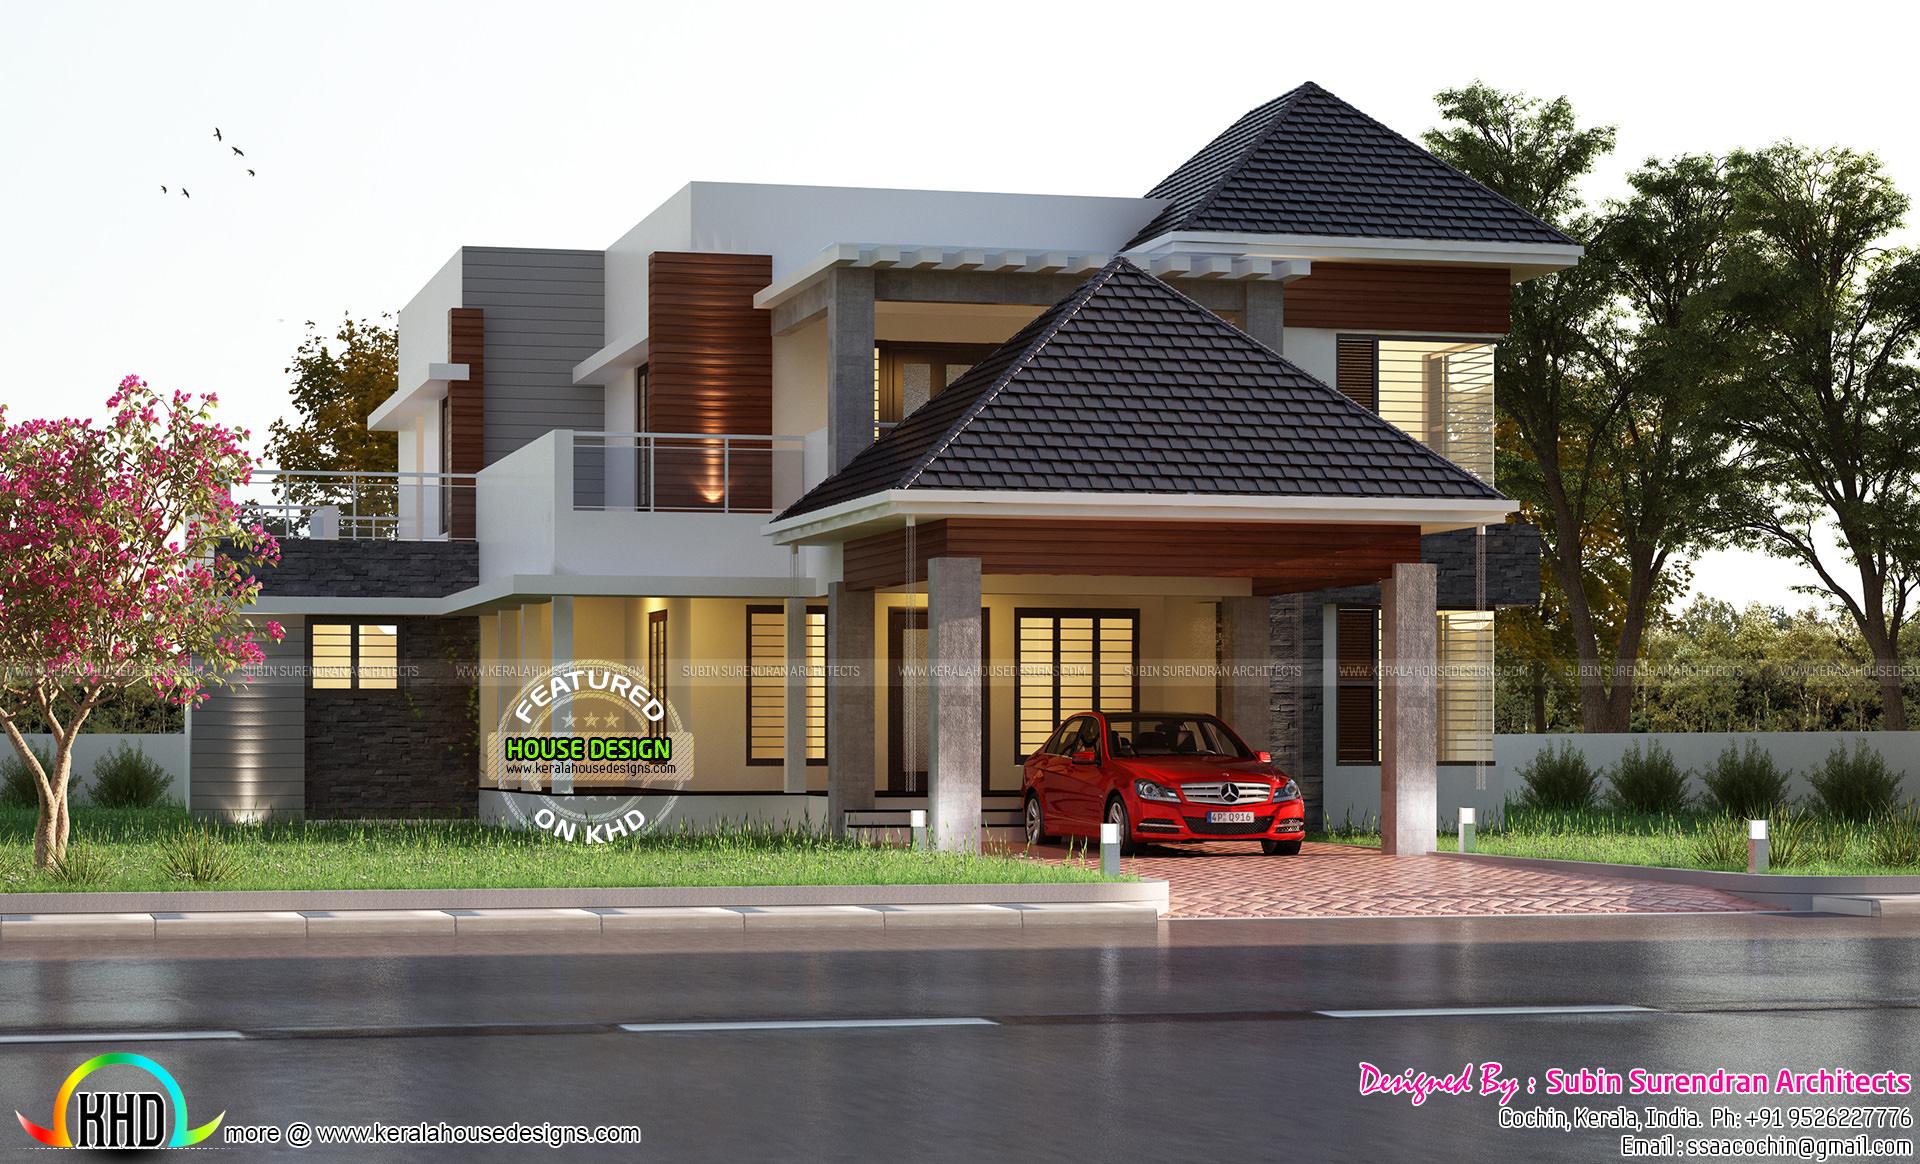 House design khd - Premium Kerala Home Design